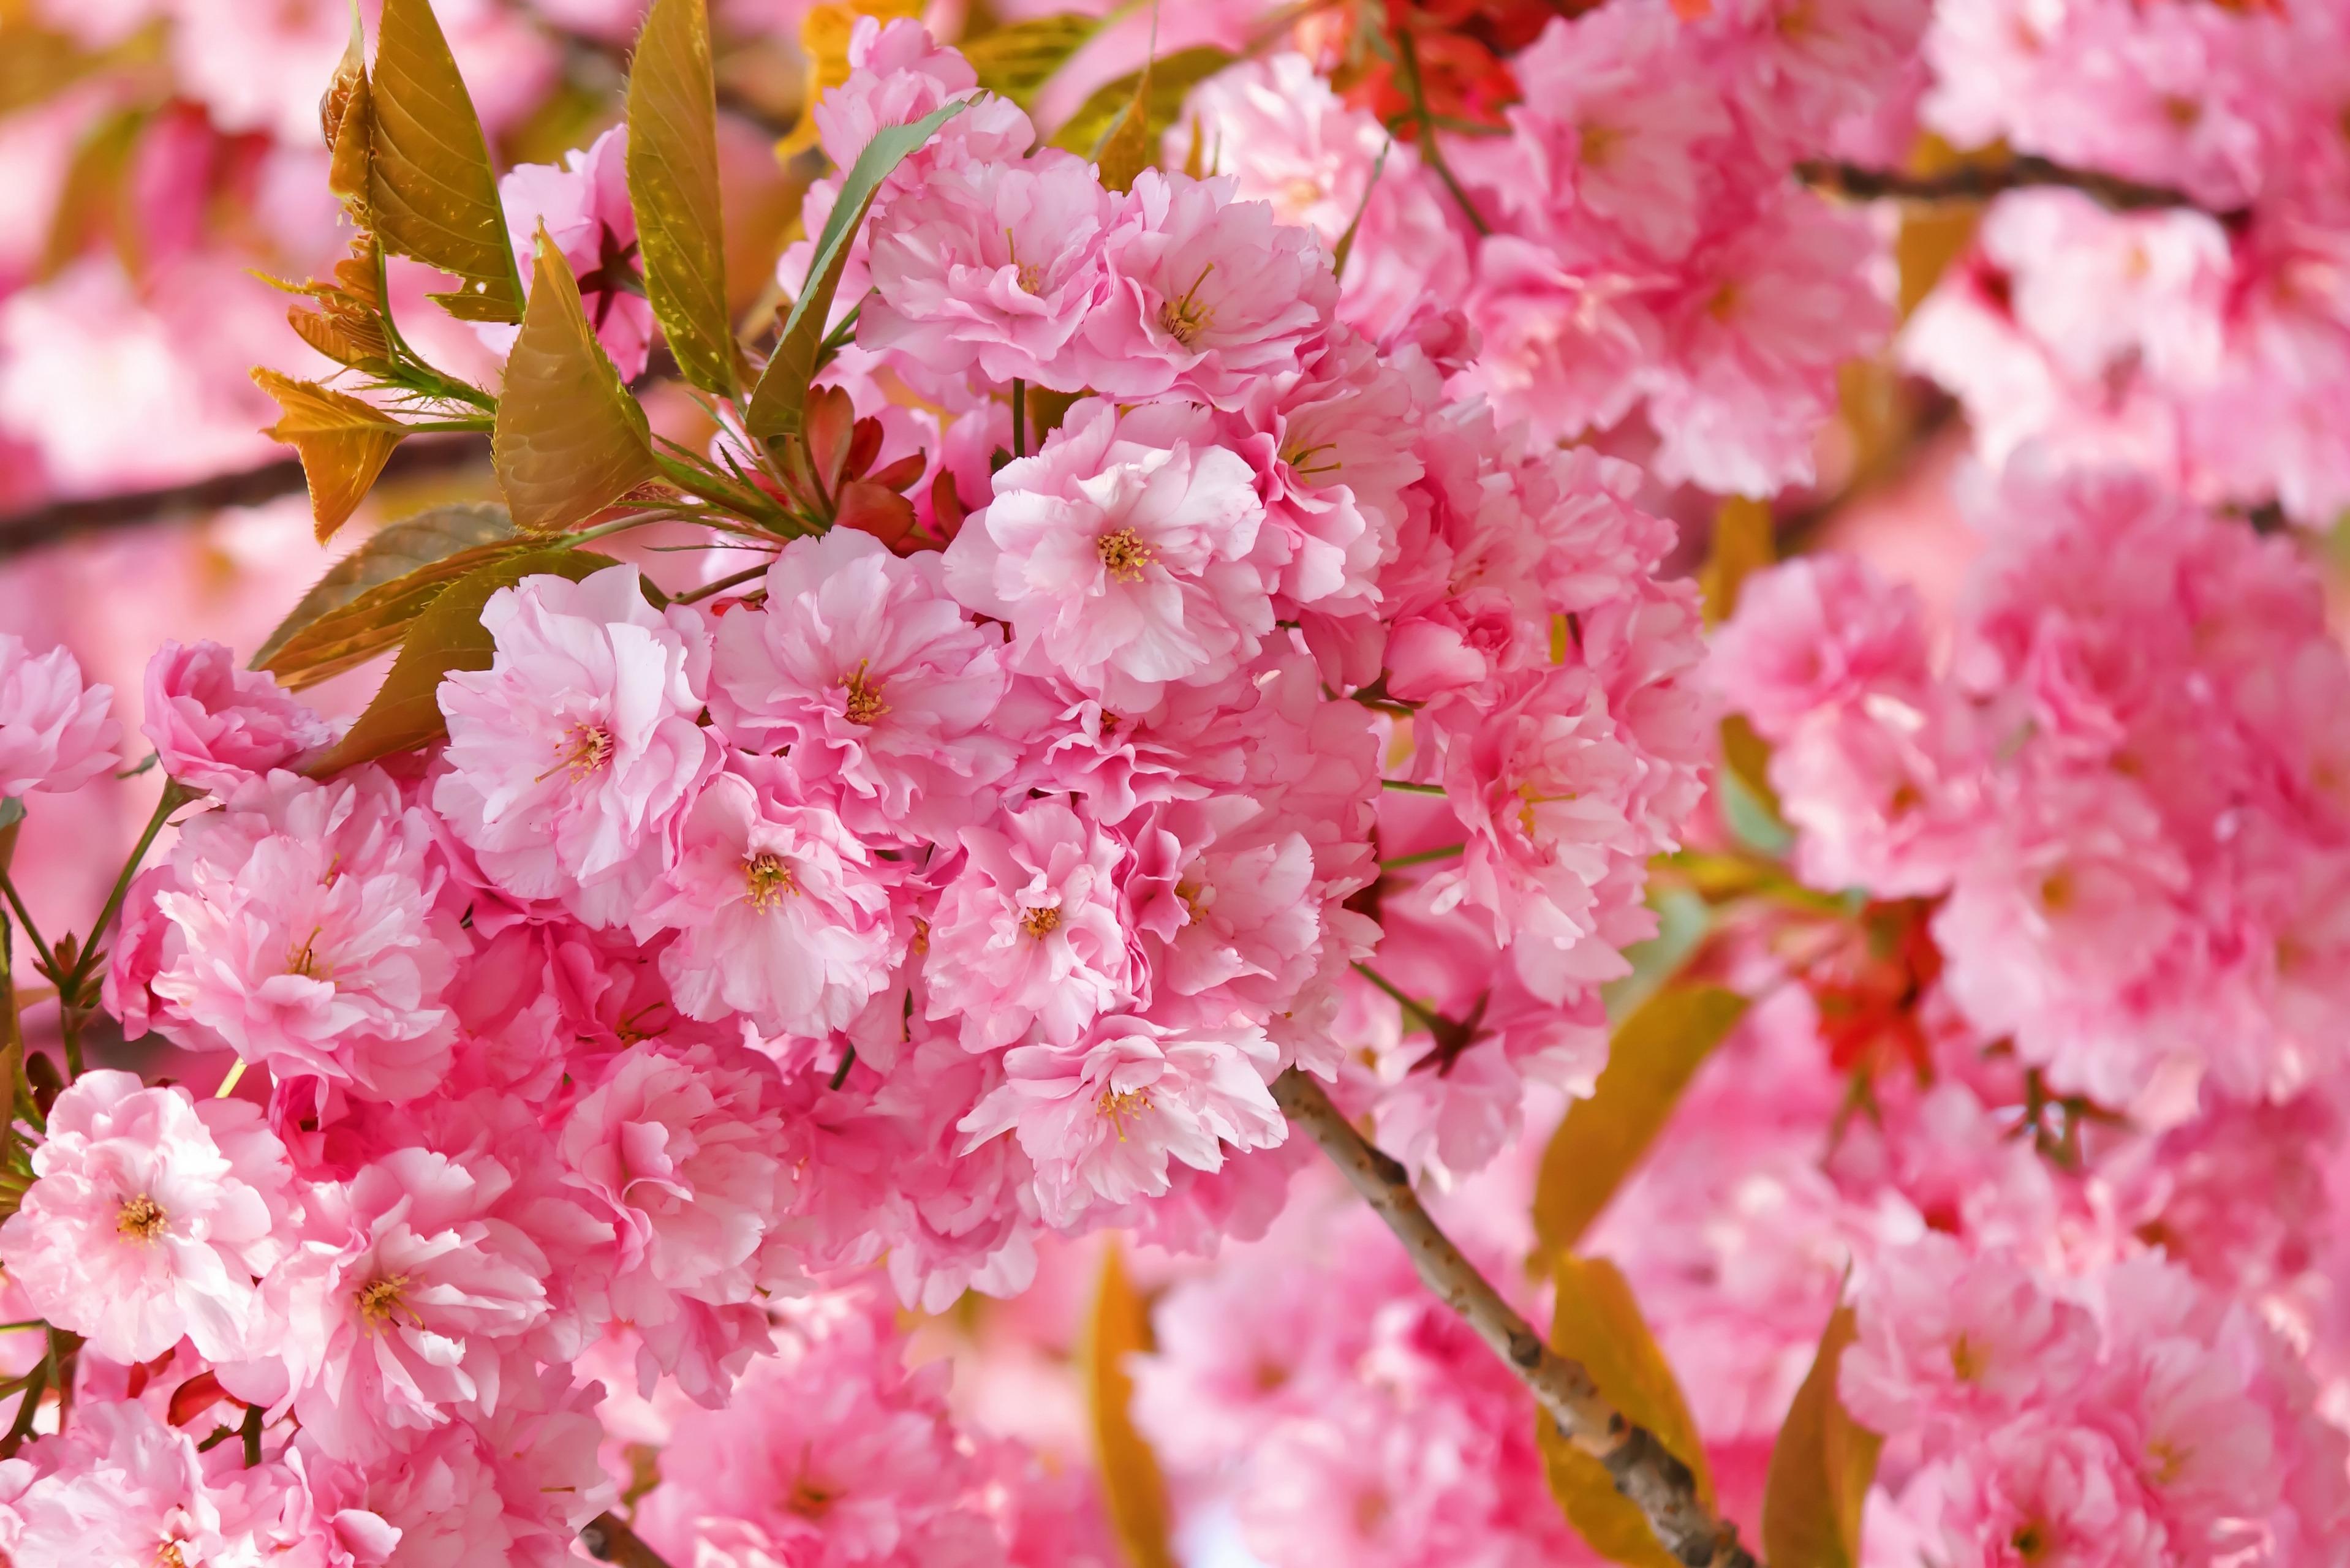 spring wallpaper free - HD1920×1080